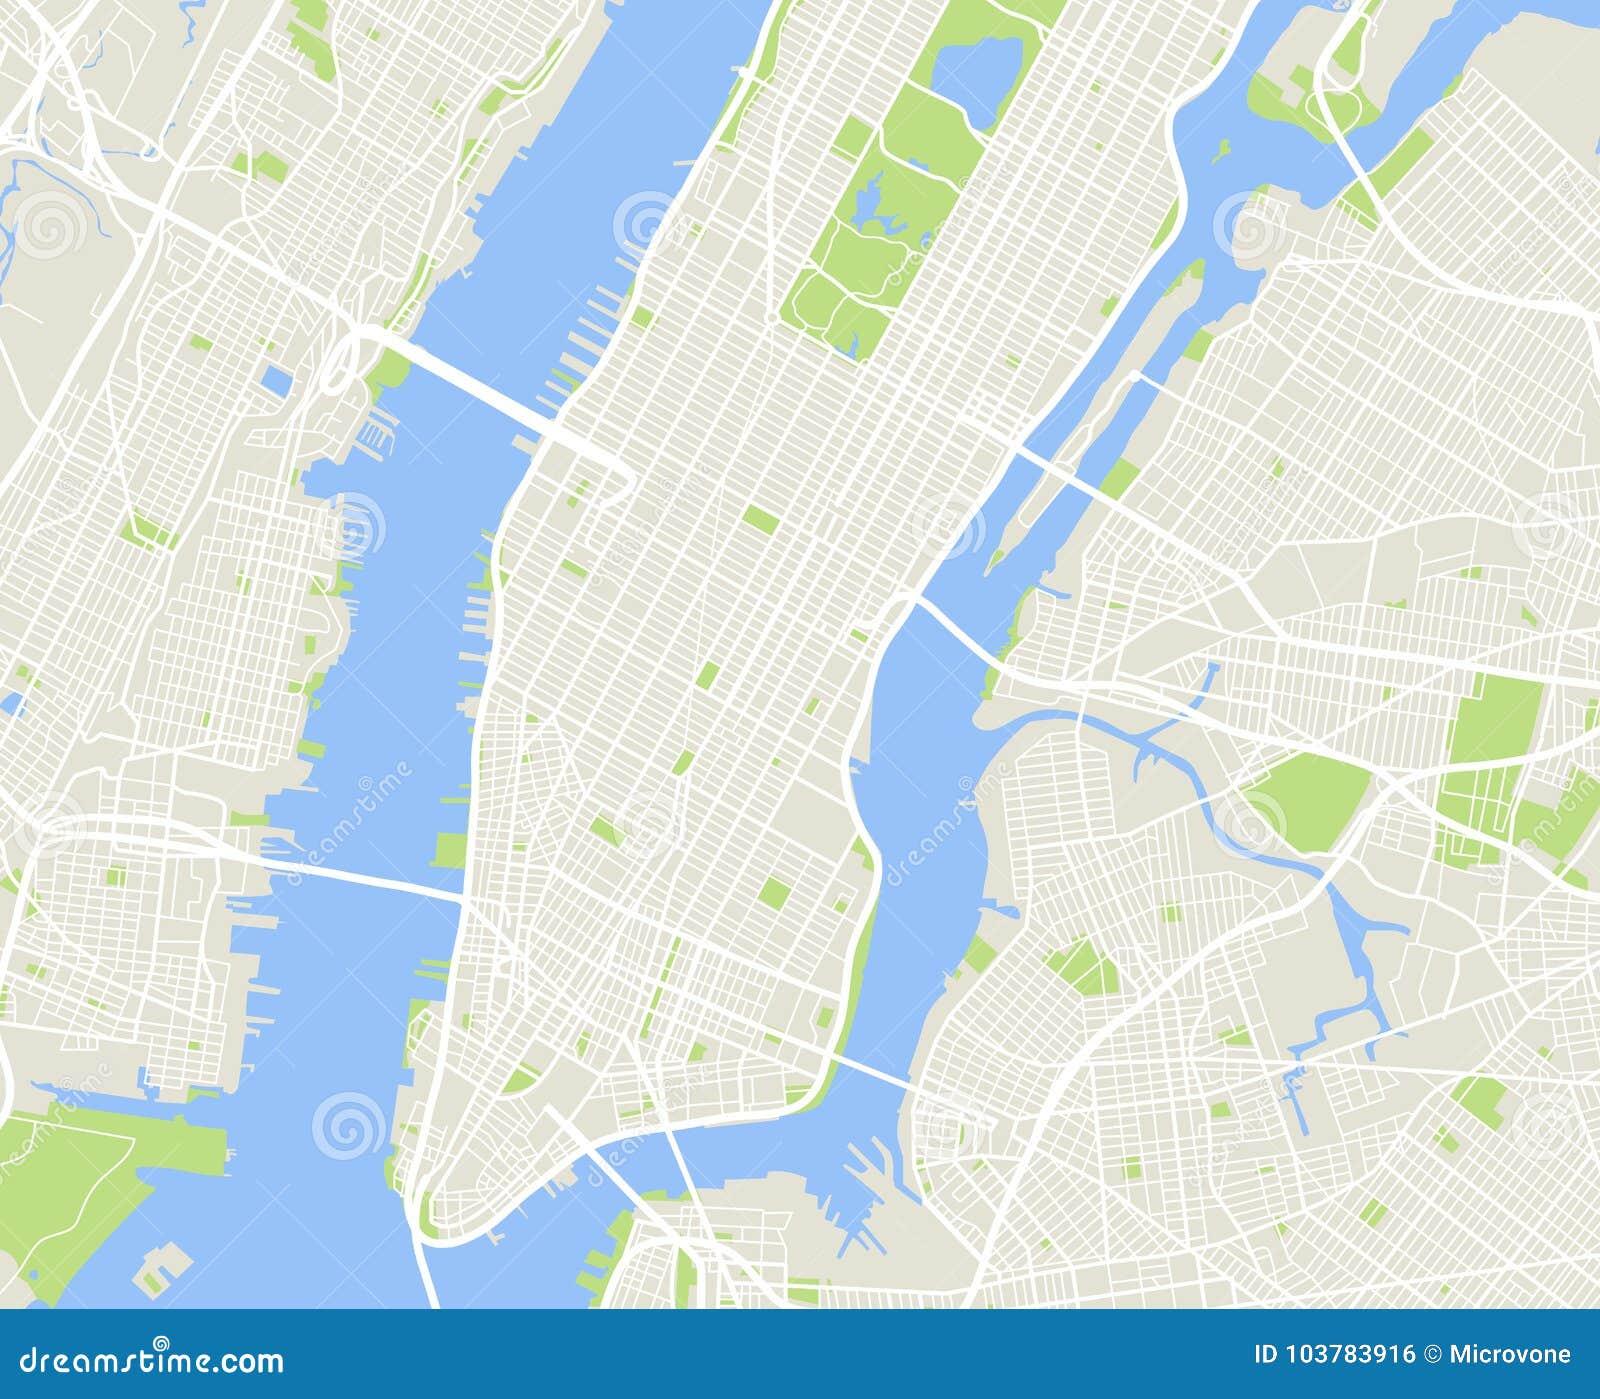 New York And Manhattan Urban City Vector Map Stock Vector